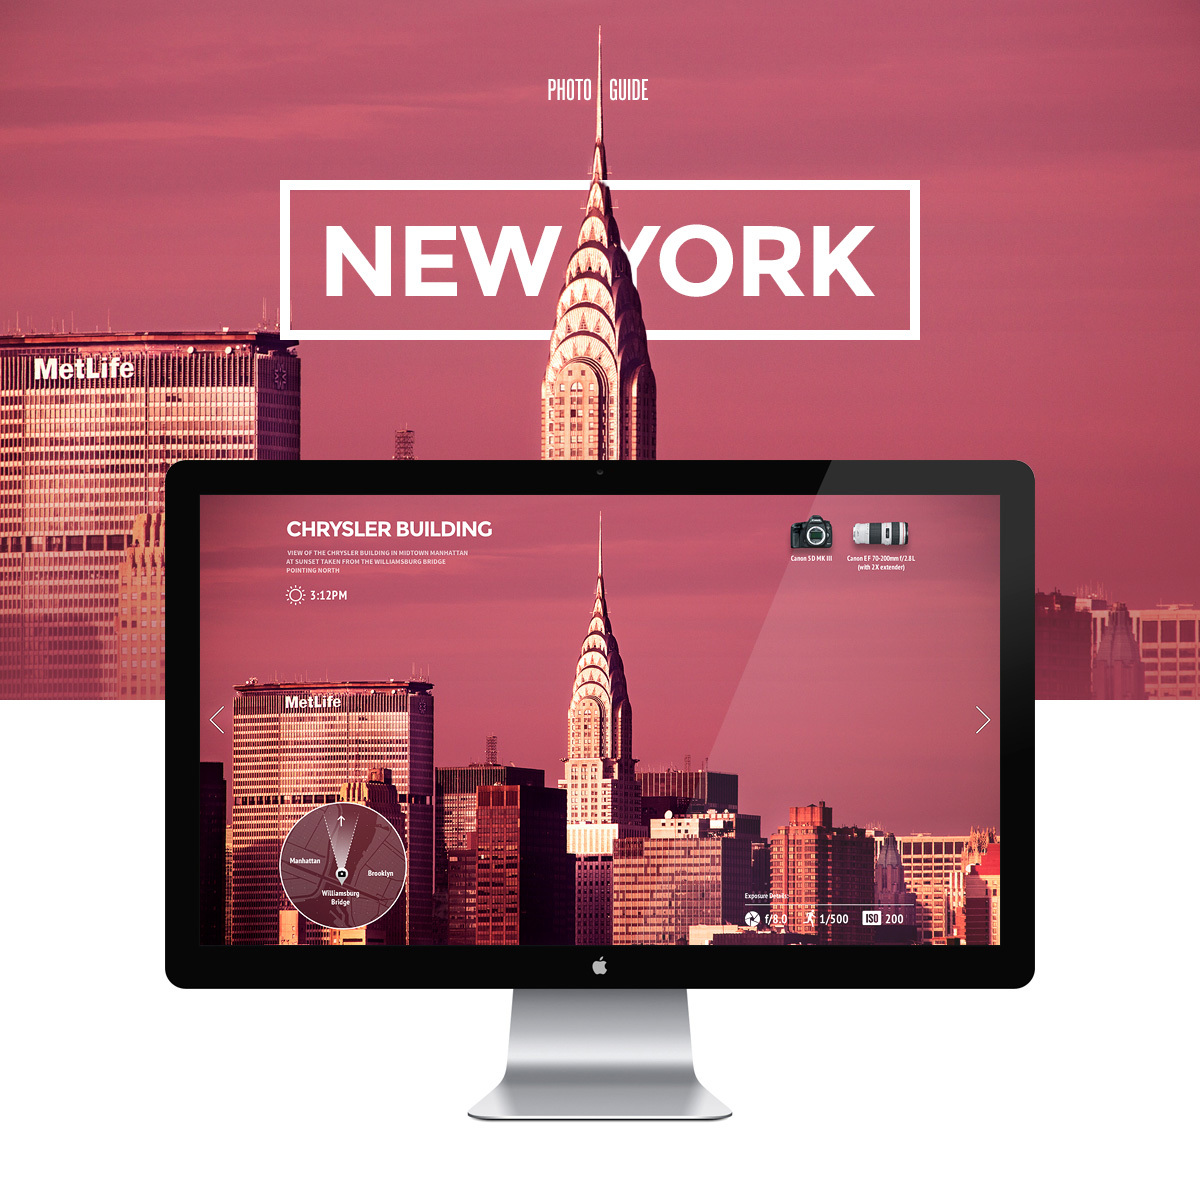 10 galleries in new york to visit during the art week | widewalls.